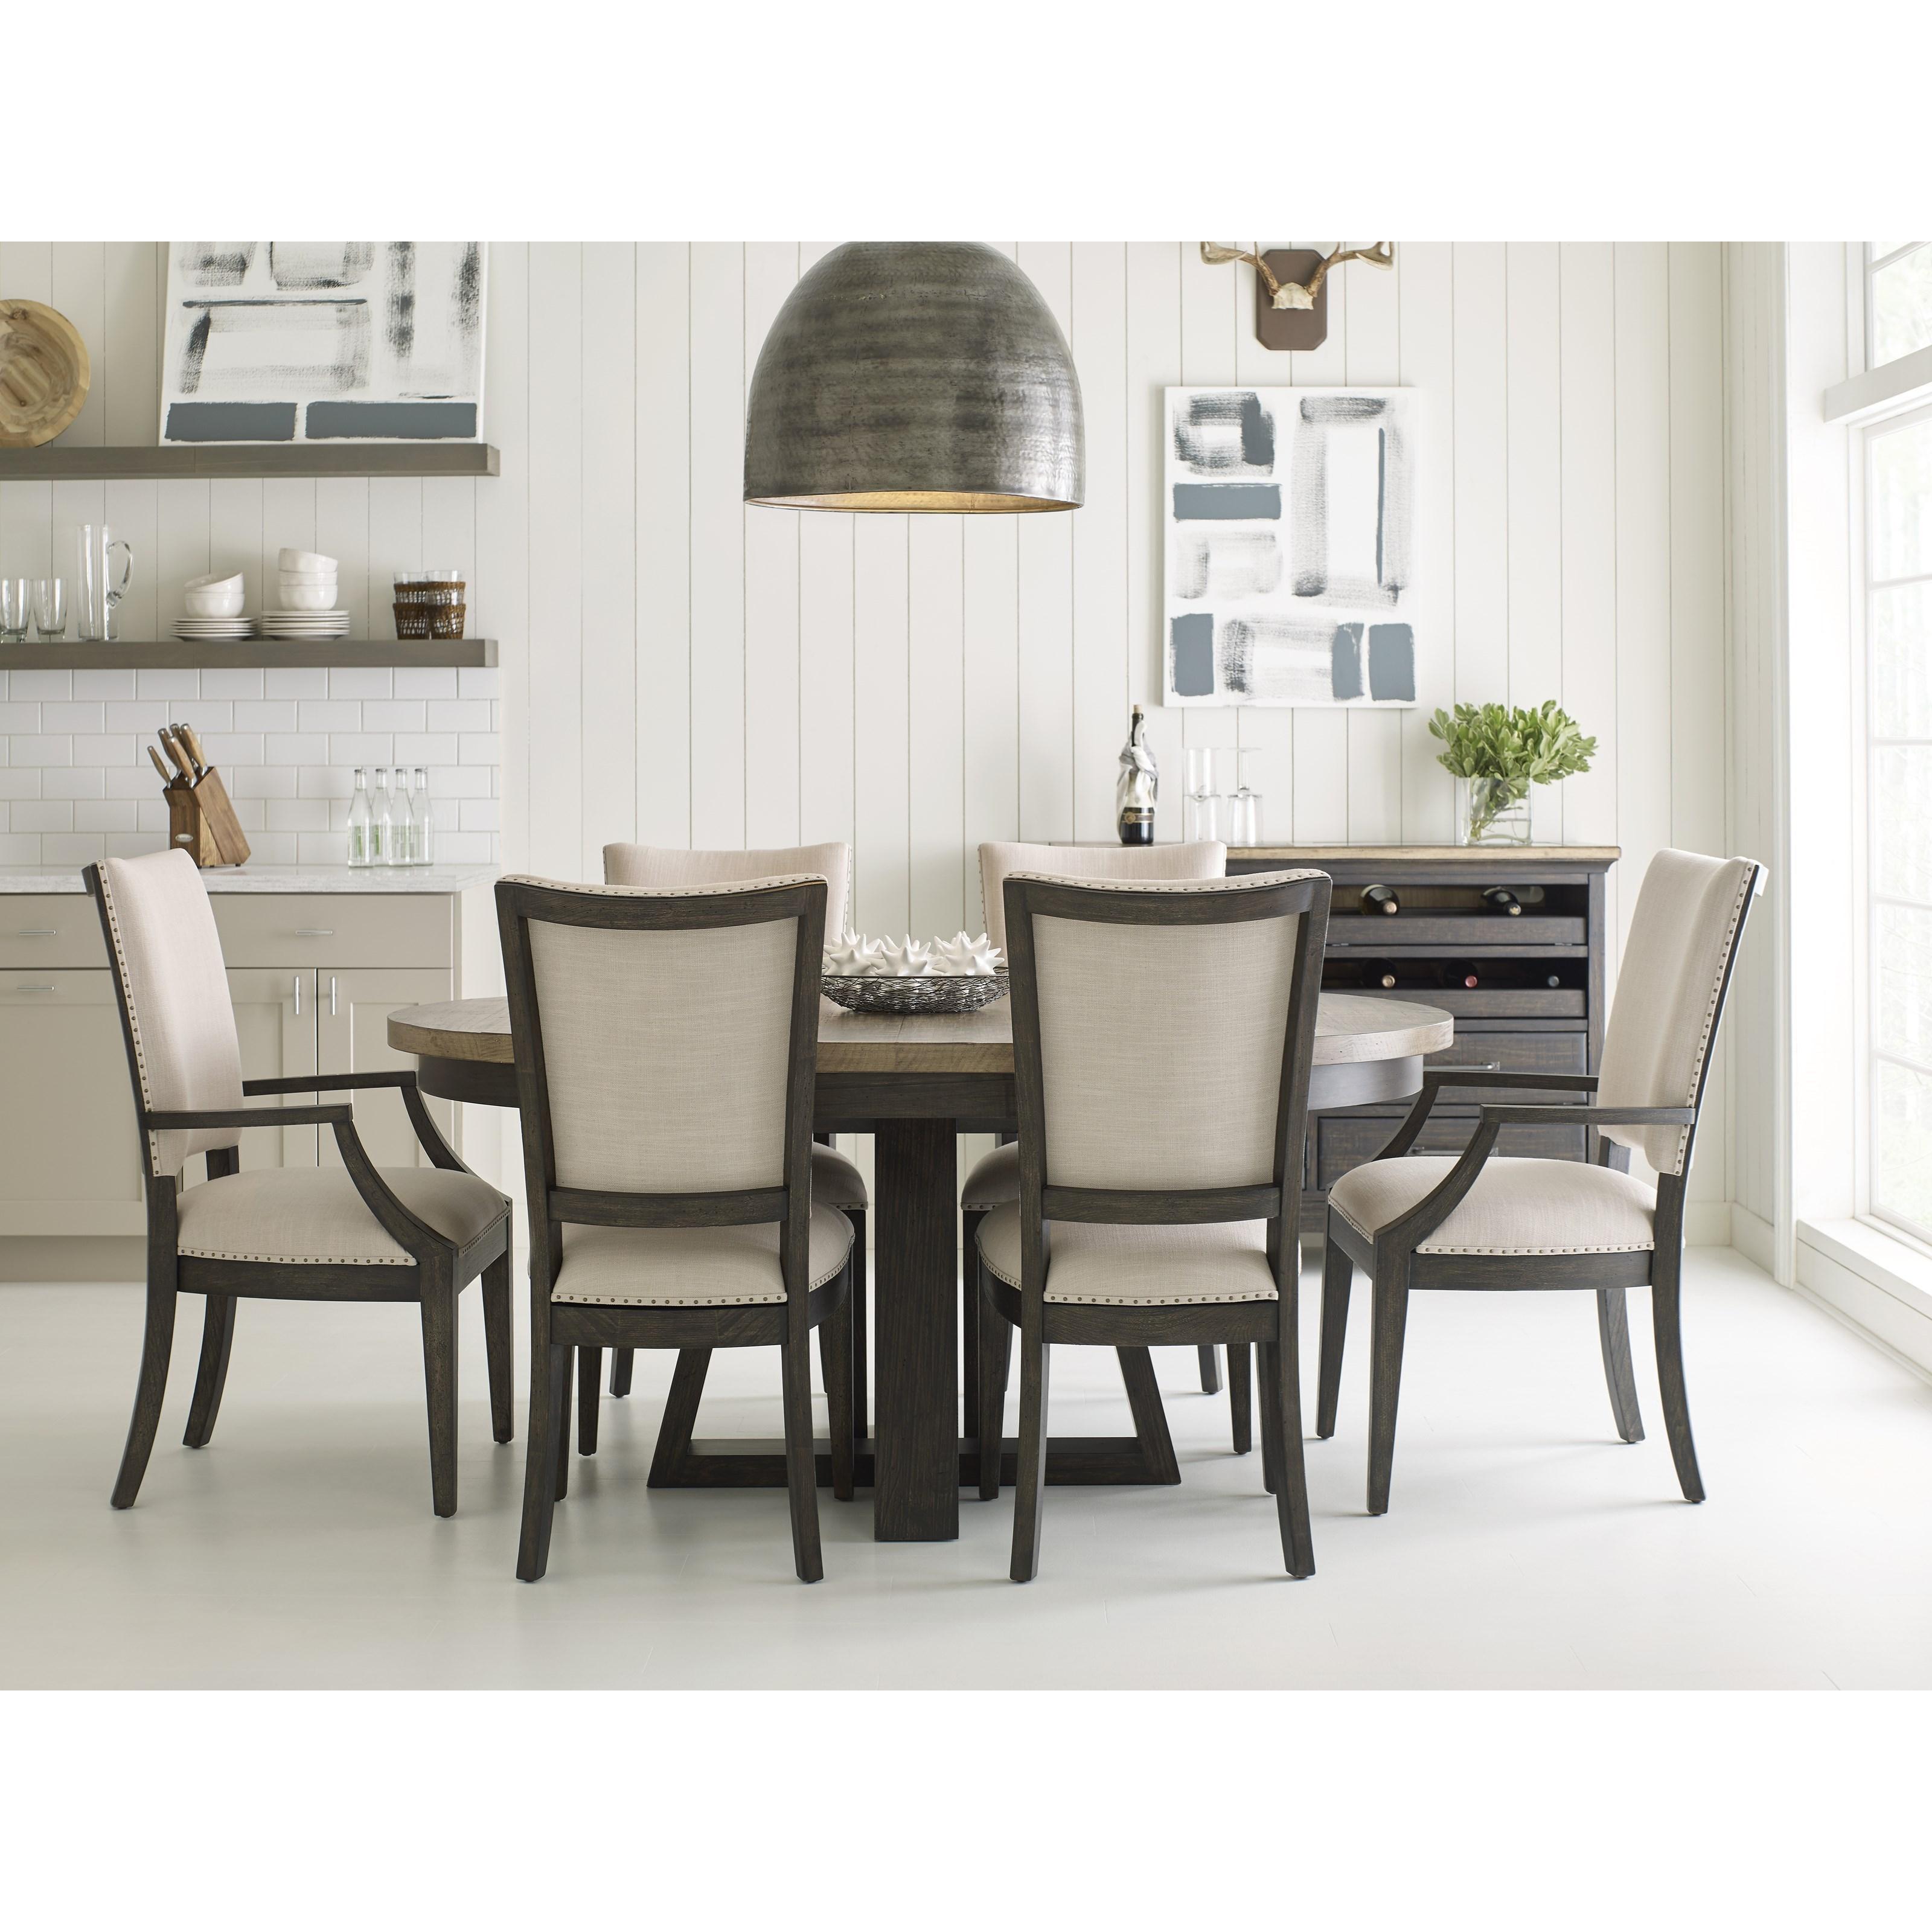 https://images.furnituredealer.net/img/products%2Fkincaid_furniture%2Fcolor%2Fplank%20road-1155234761_706c%20dining%20room%20group%206-b1.jpg